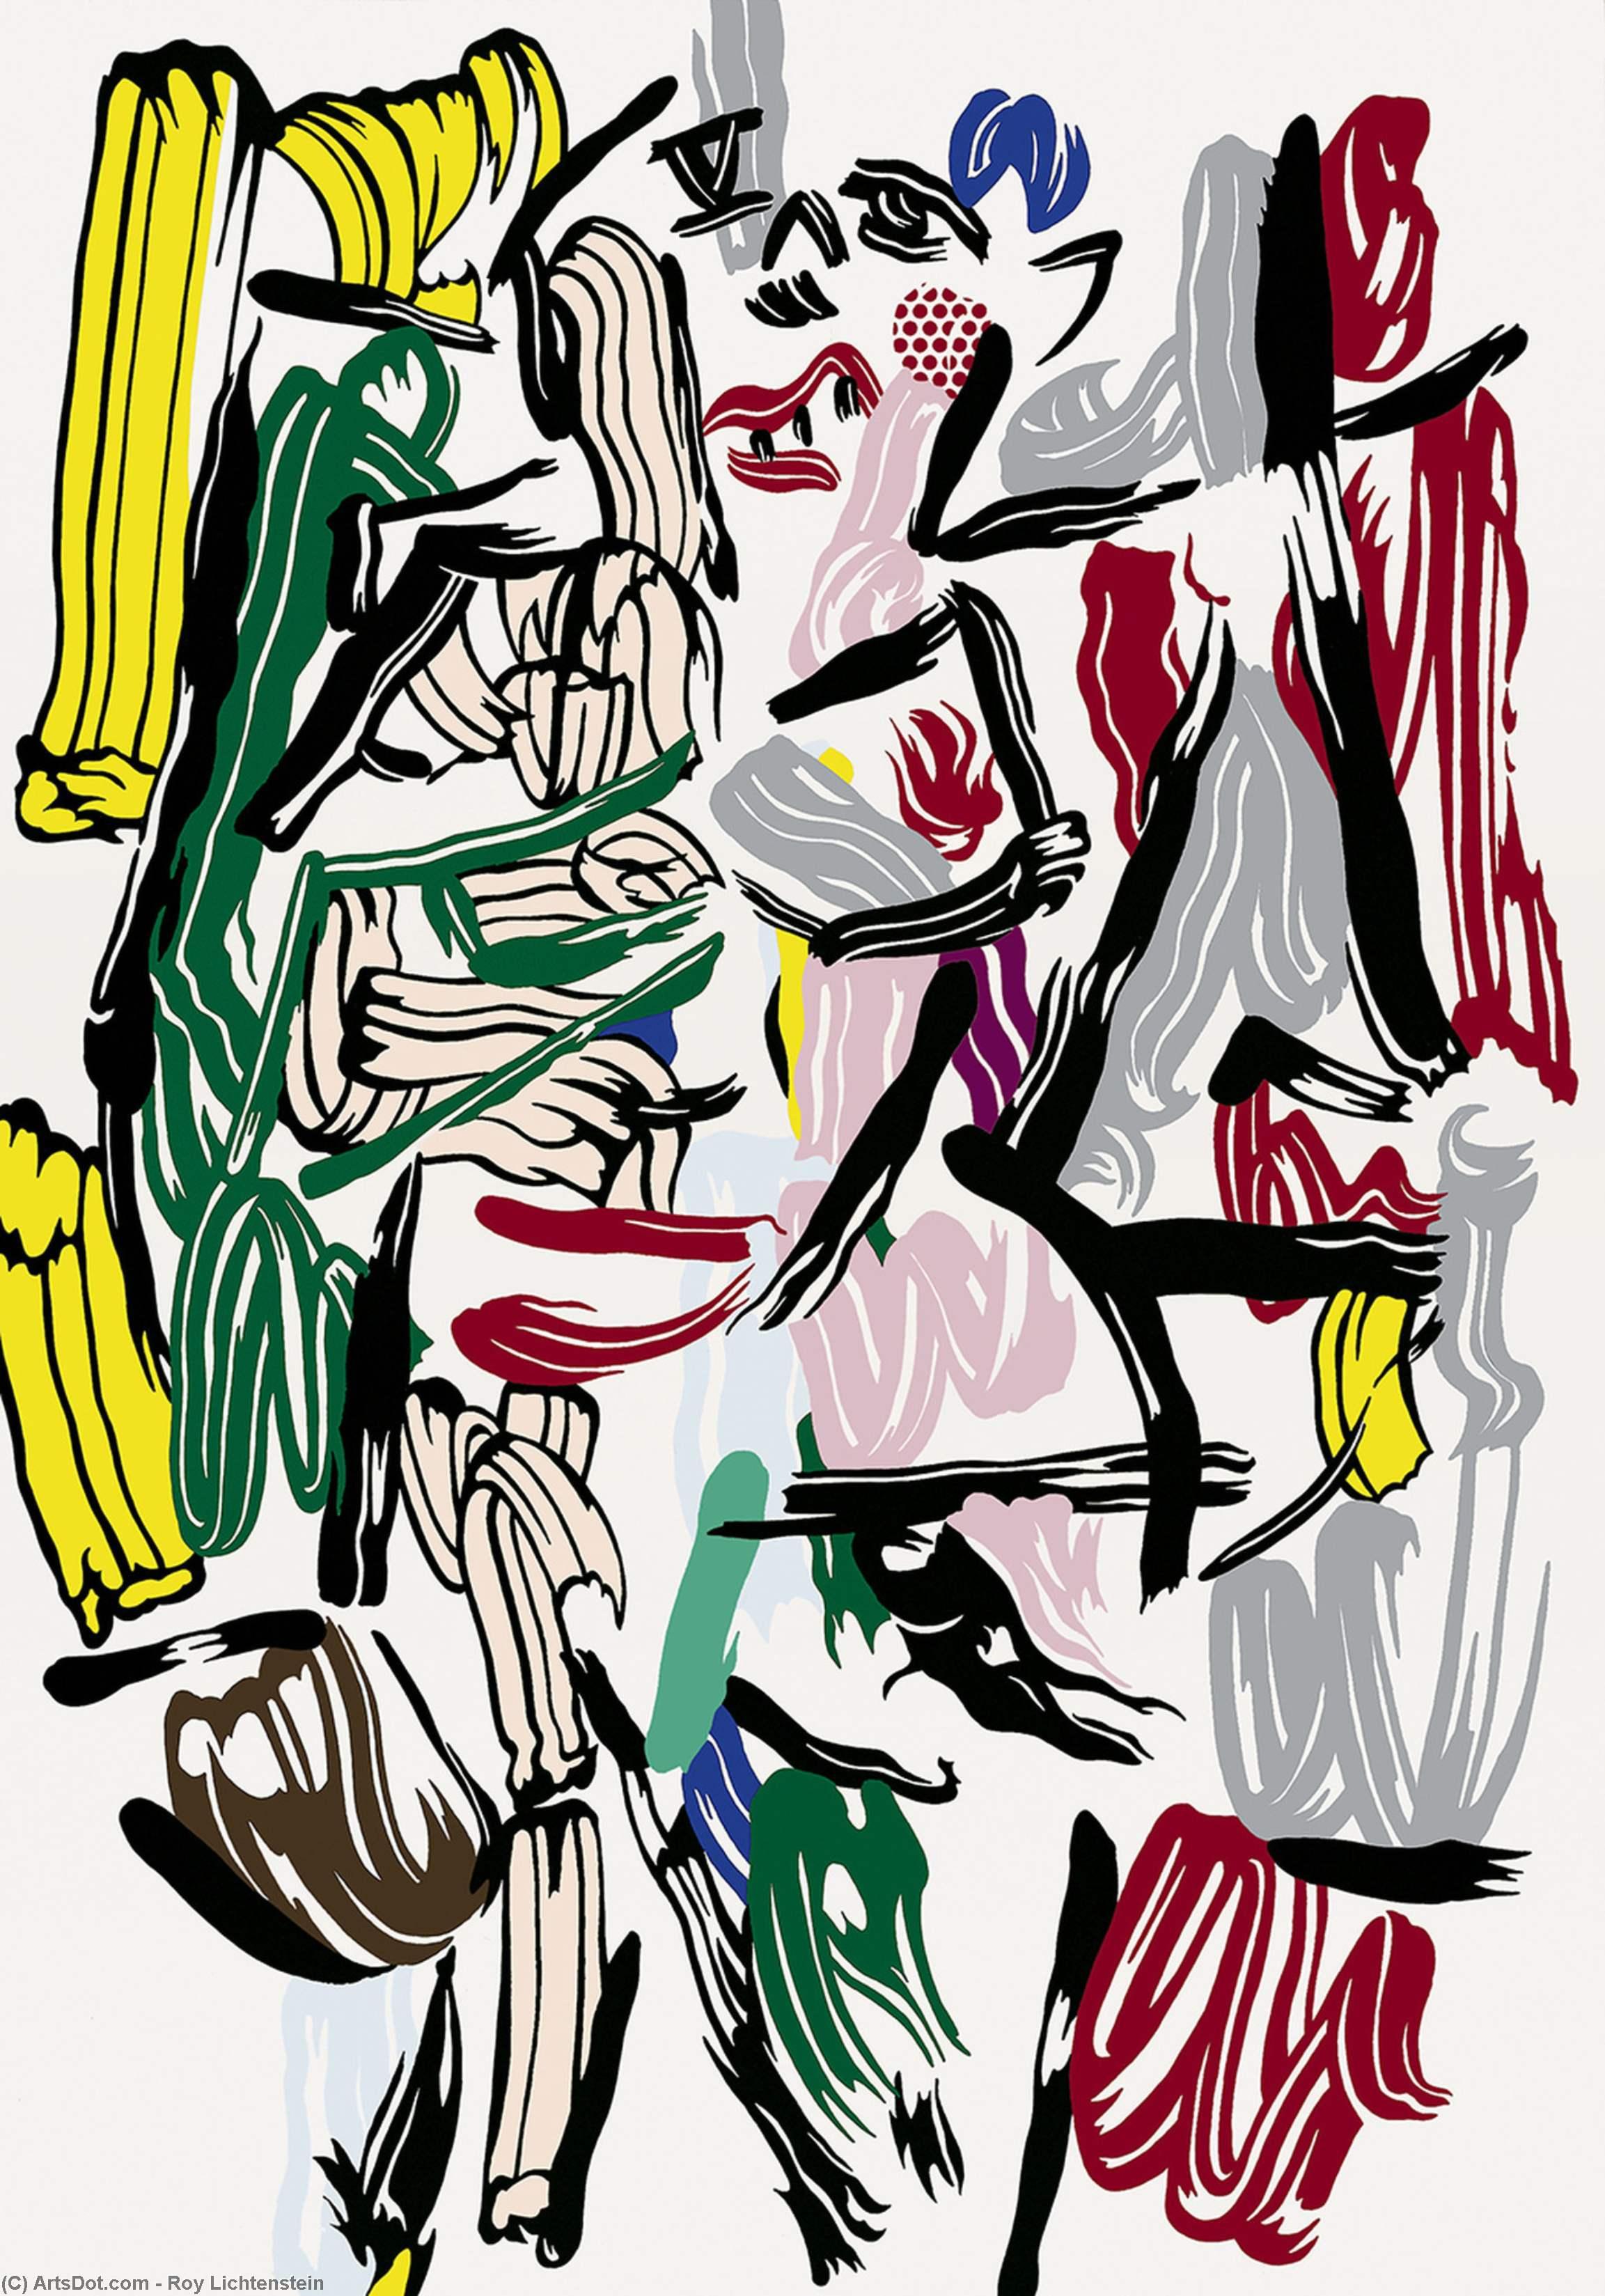 representational art visual arts encyclopedia - 800×800